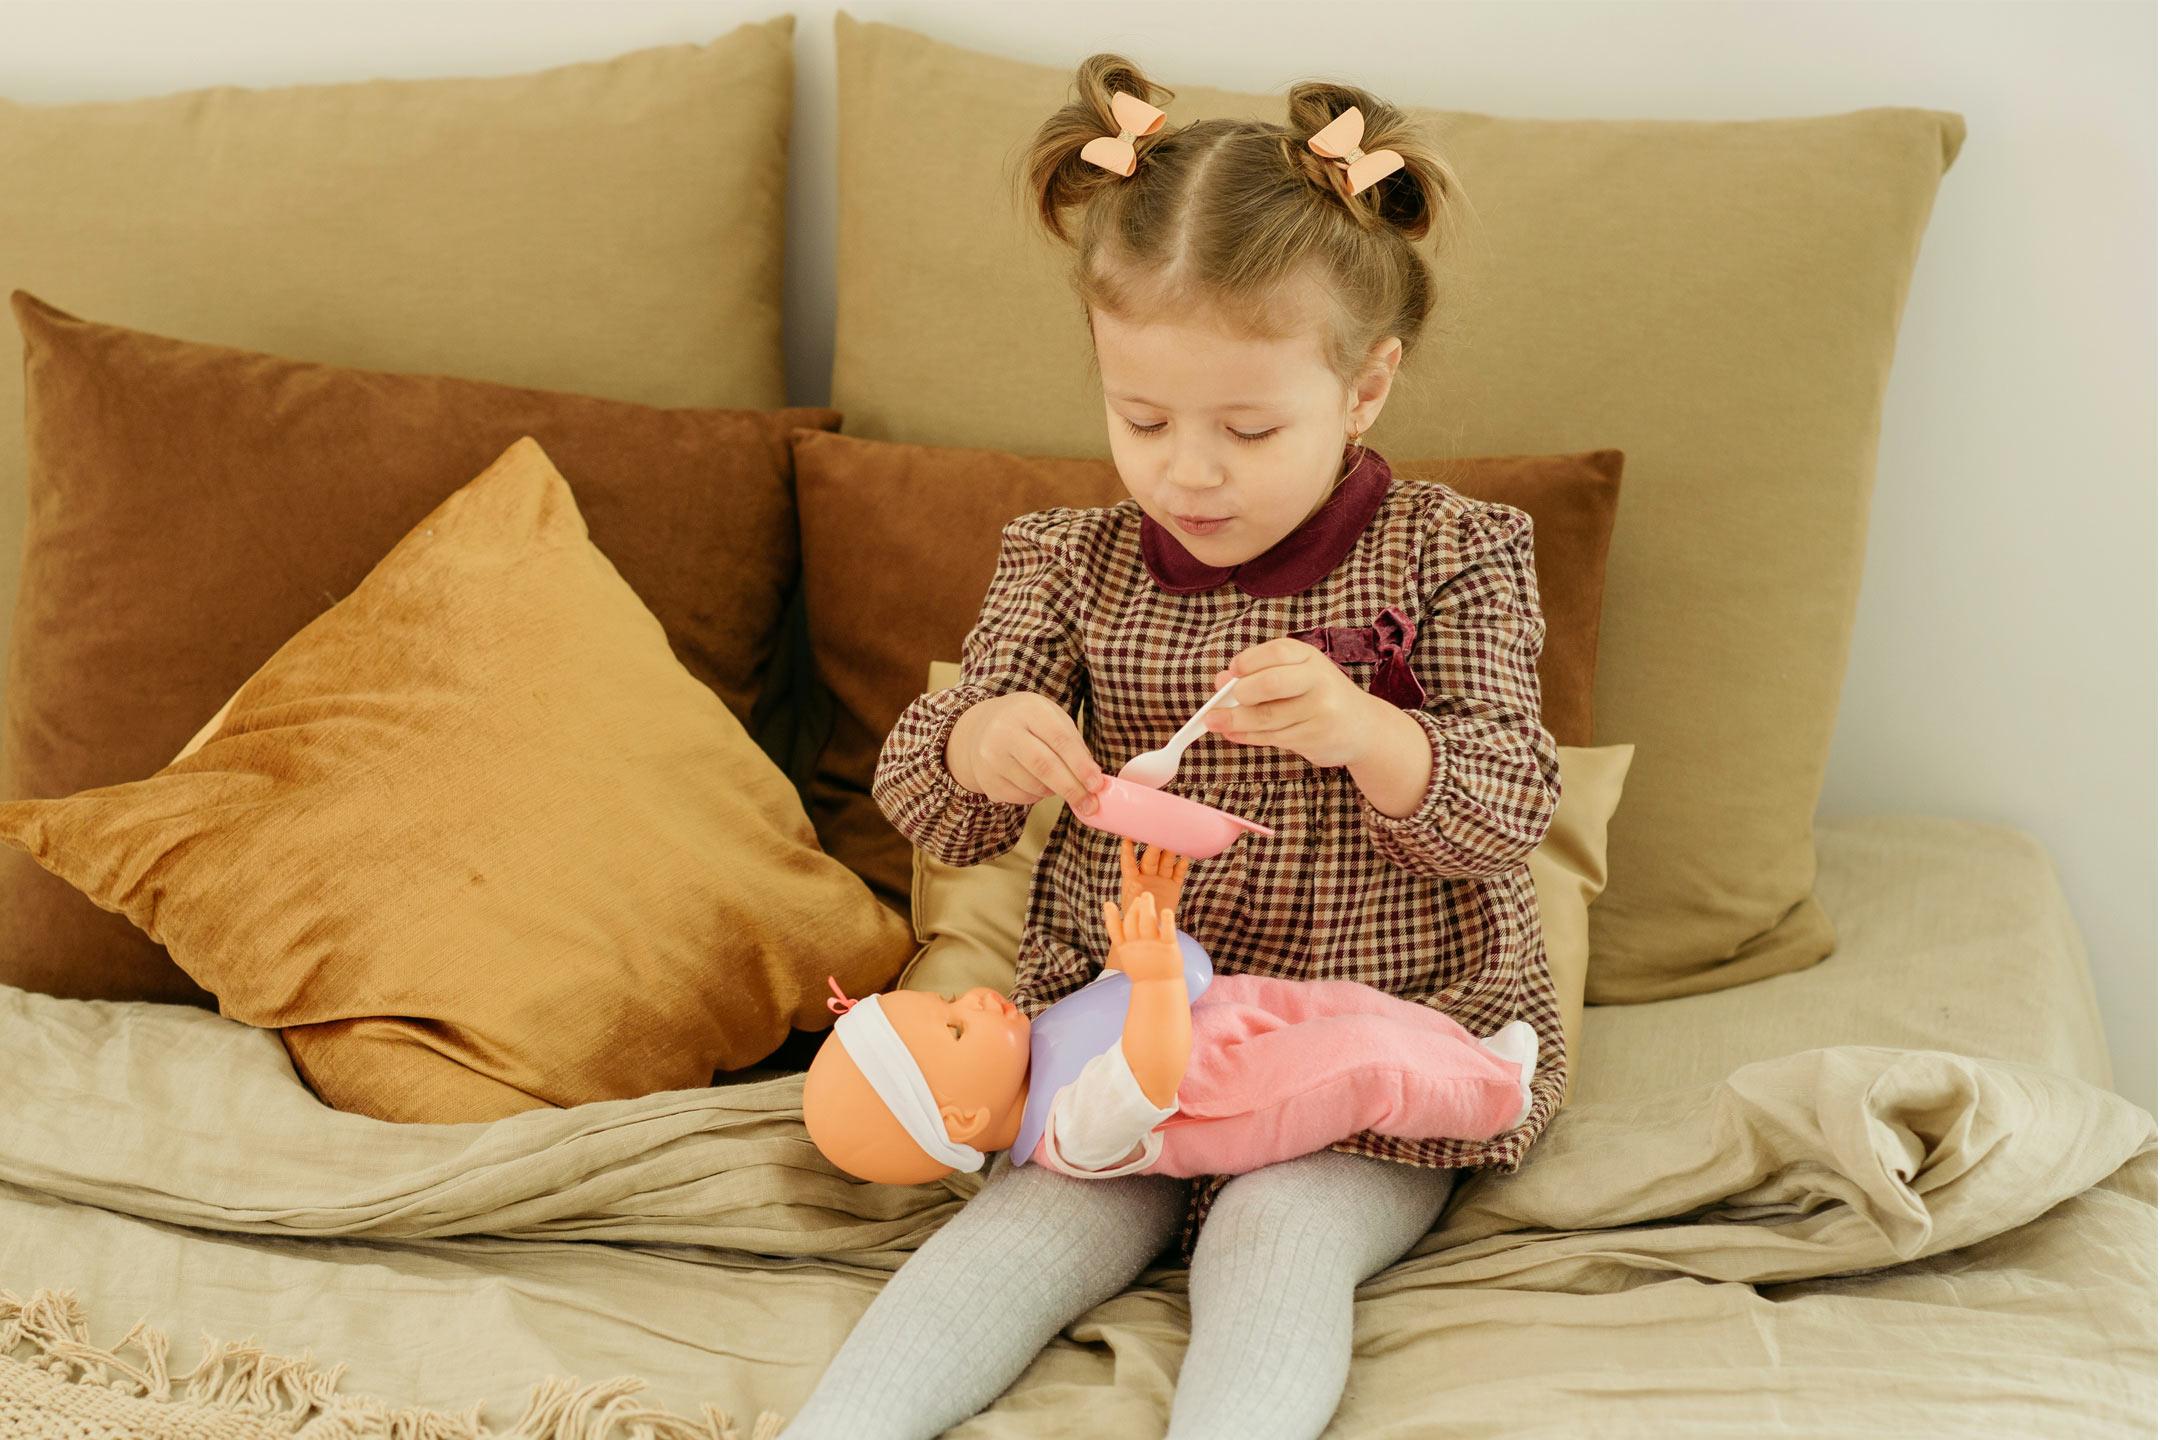 little-girl-feeding-doll2160